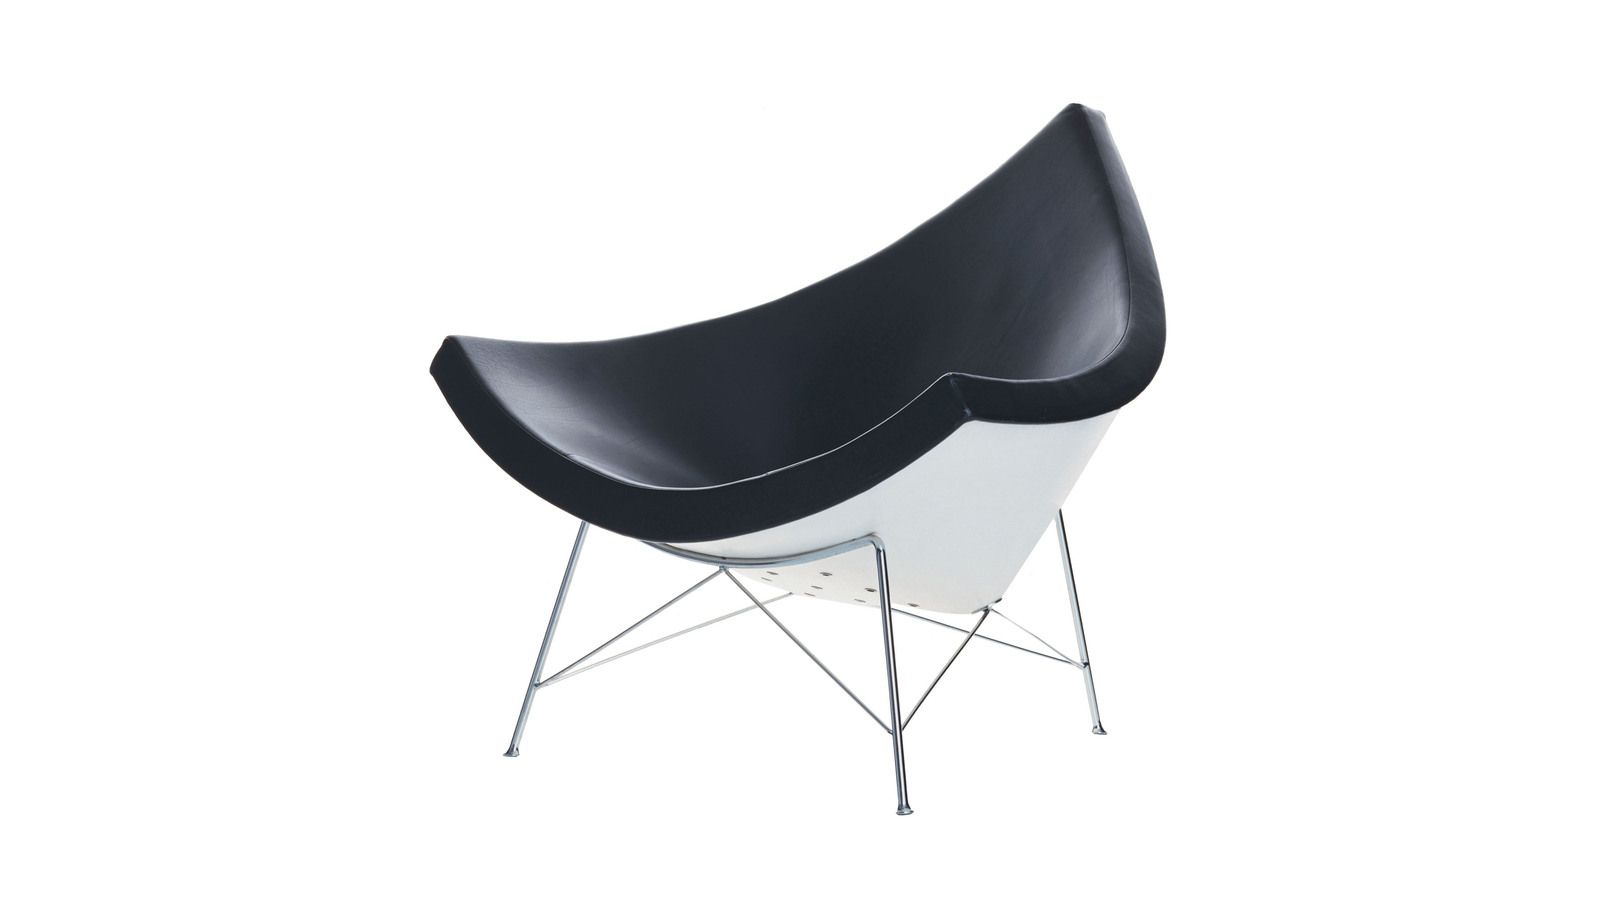 Coconut Chair Oturma Mobilyasi Koltuk Butterfly Chair Chair Eames Chair